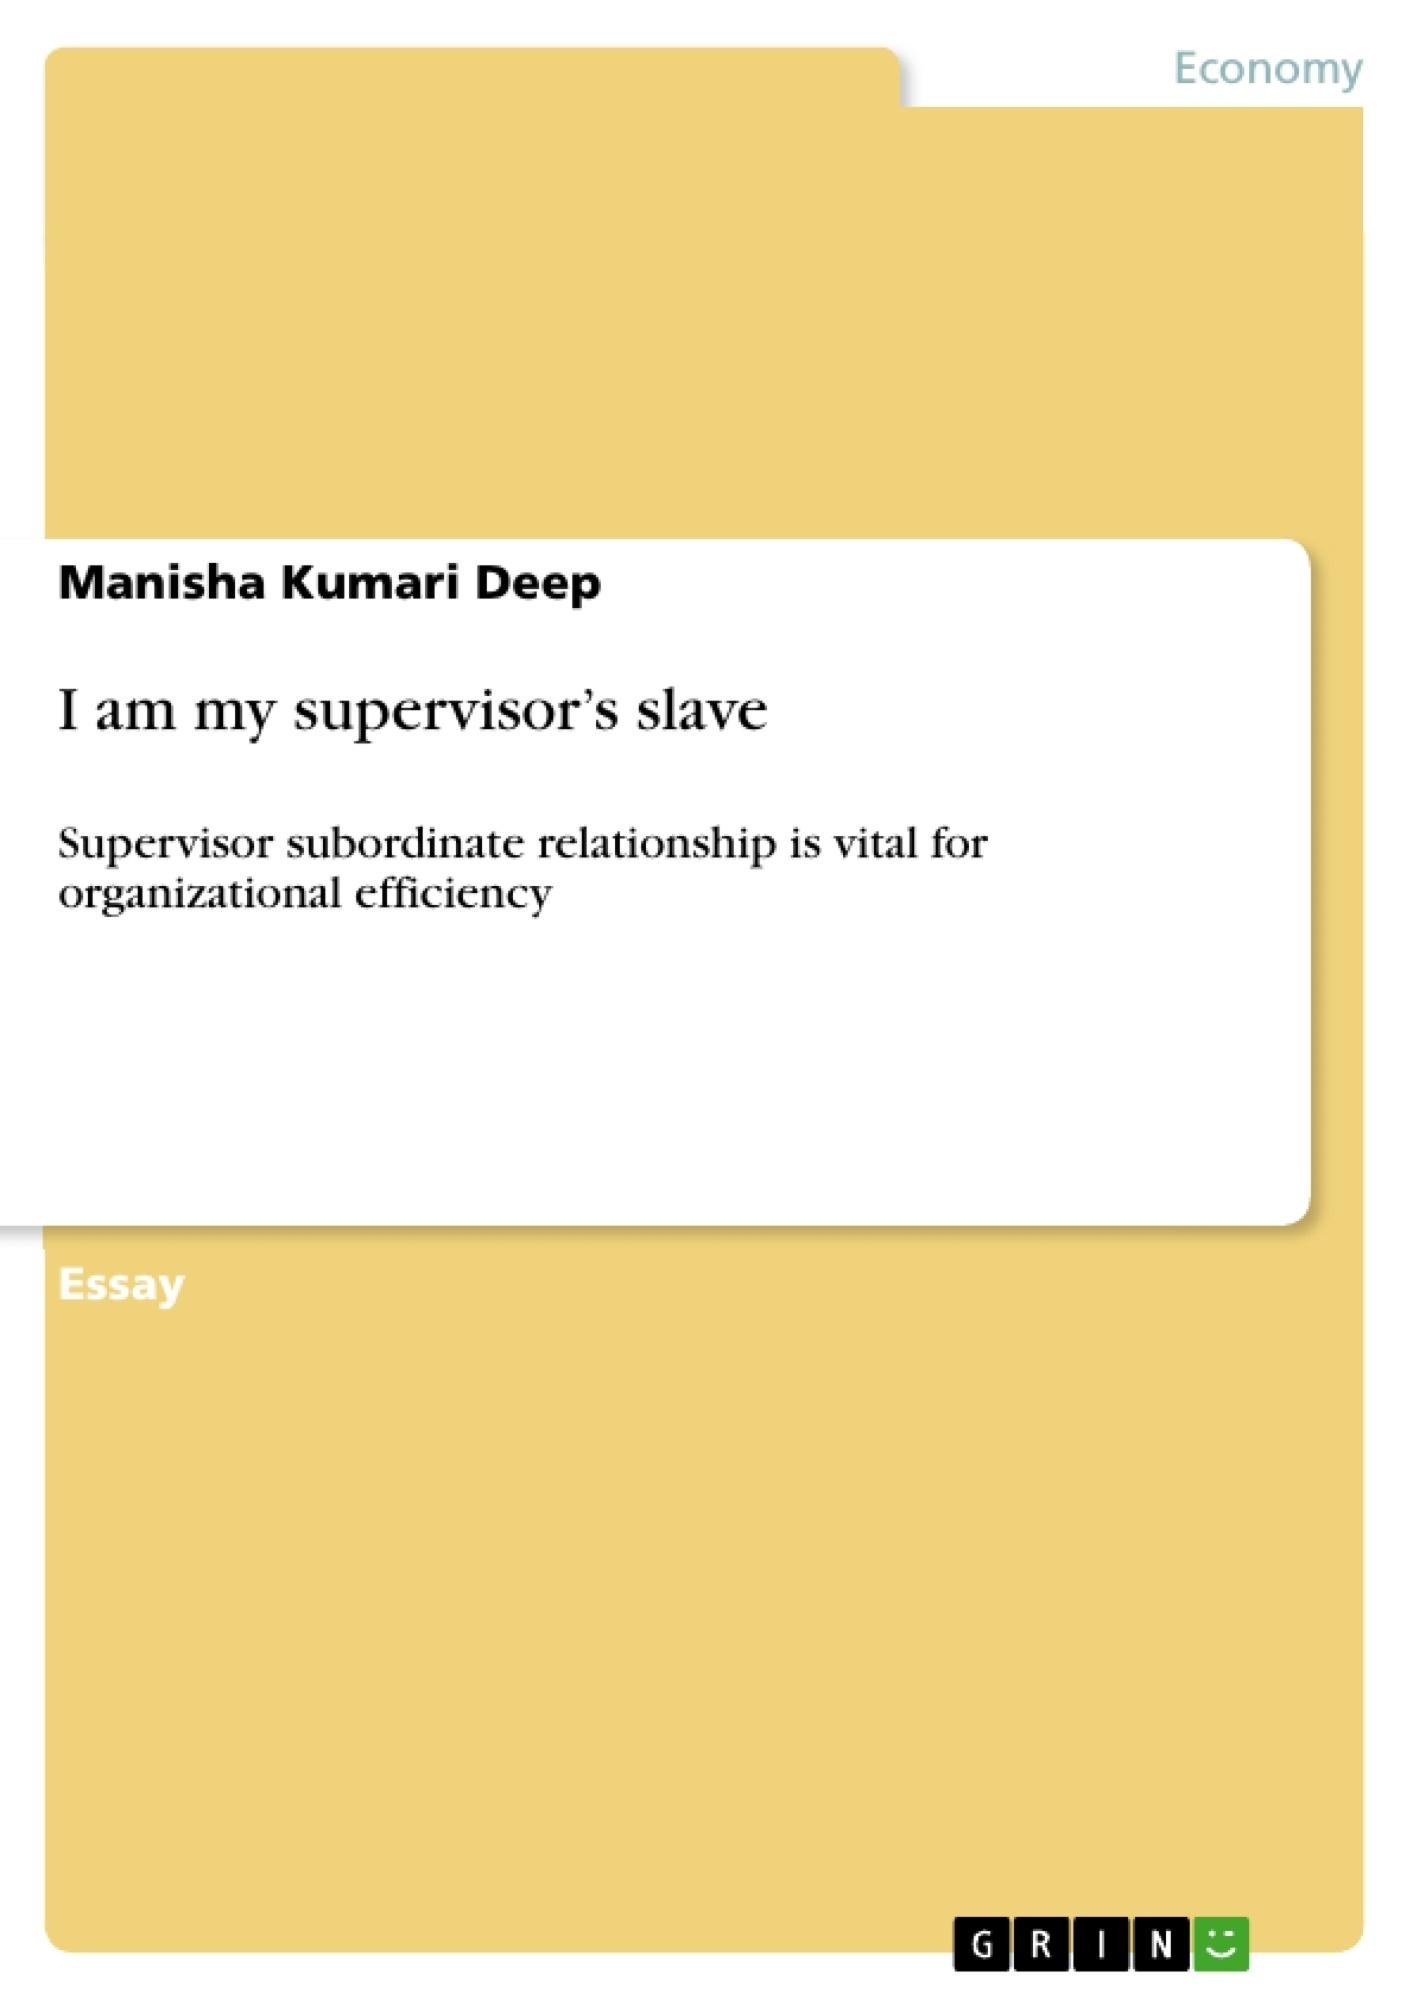 Title: I am my supervisor's slave